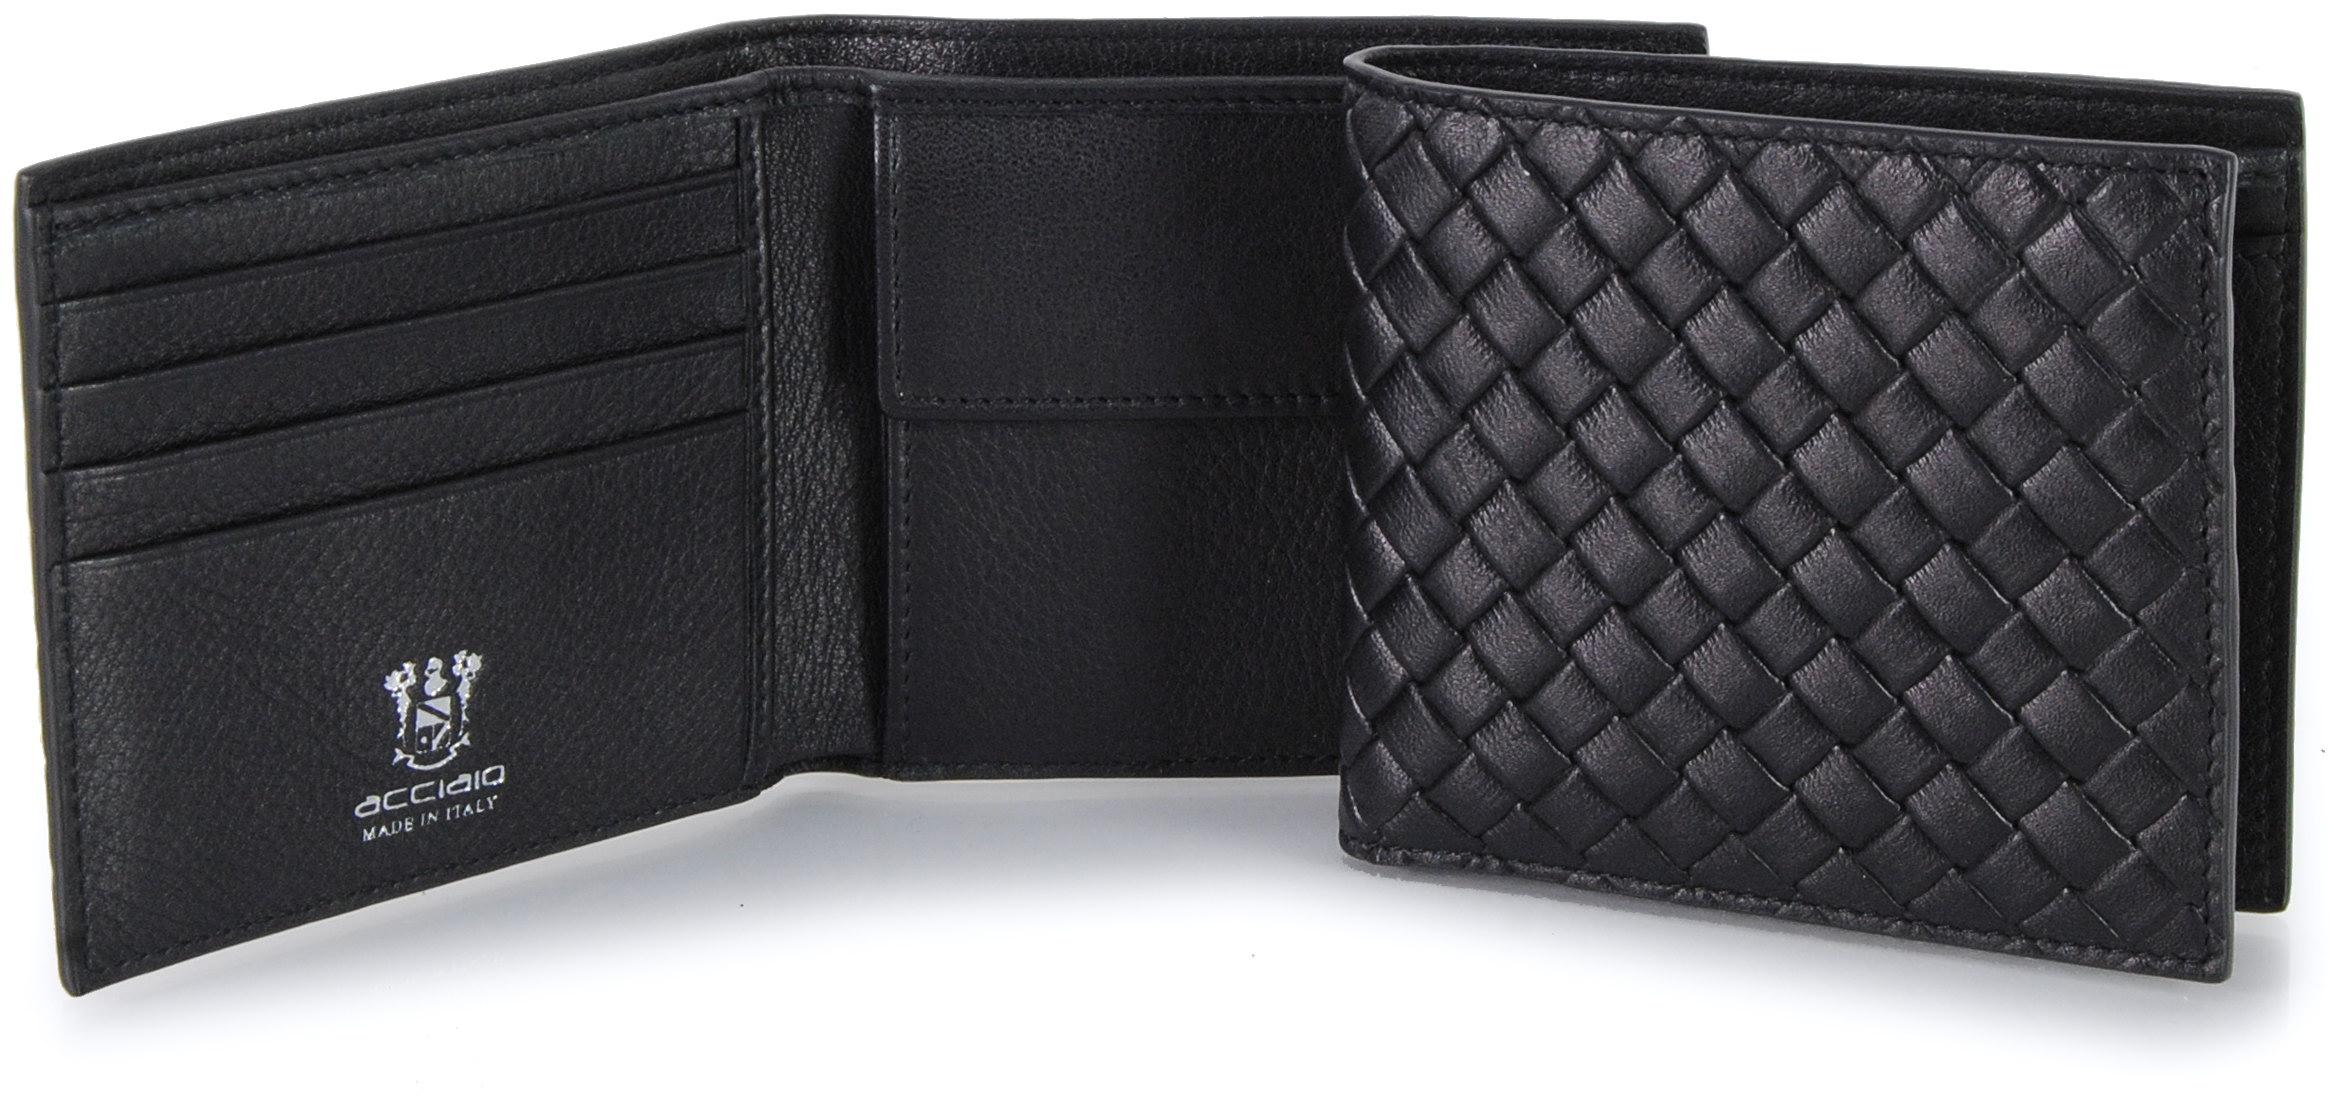 portafoglio uomo nero | Acciaio